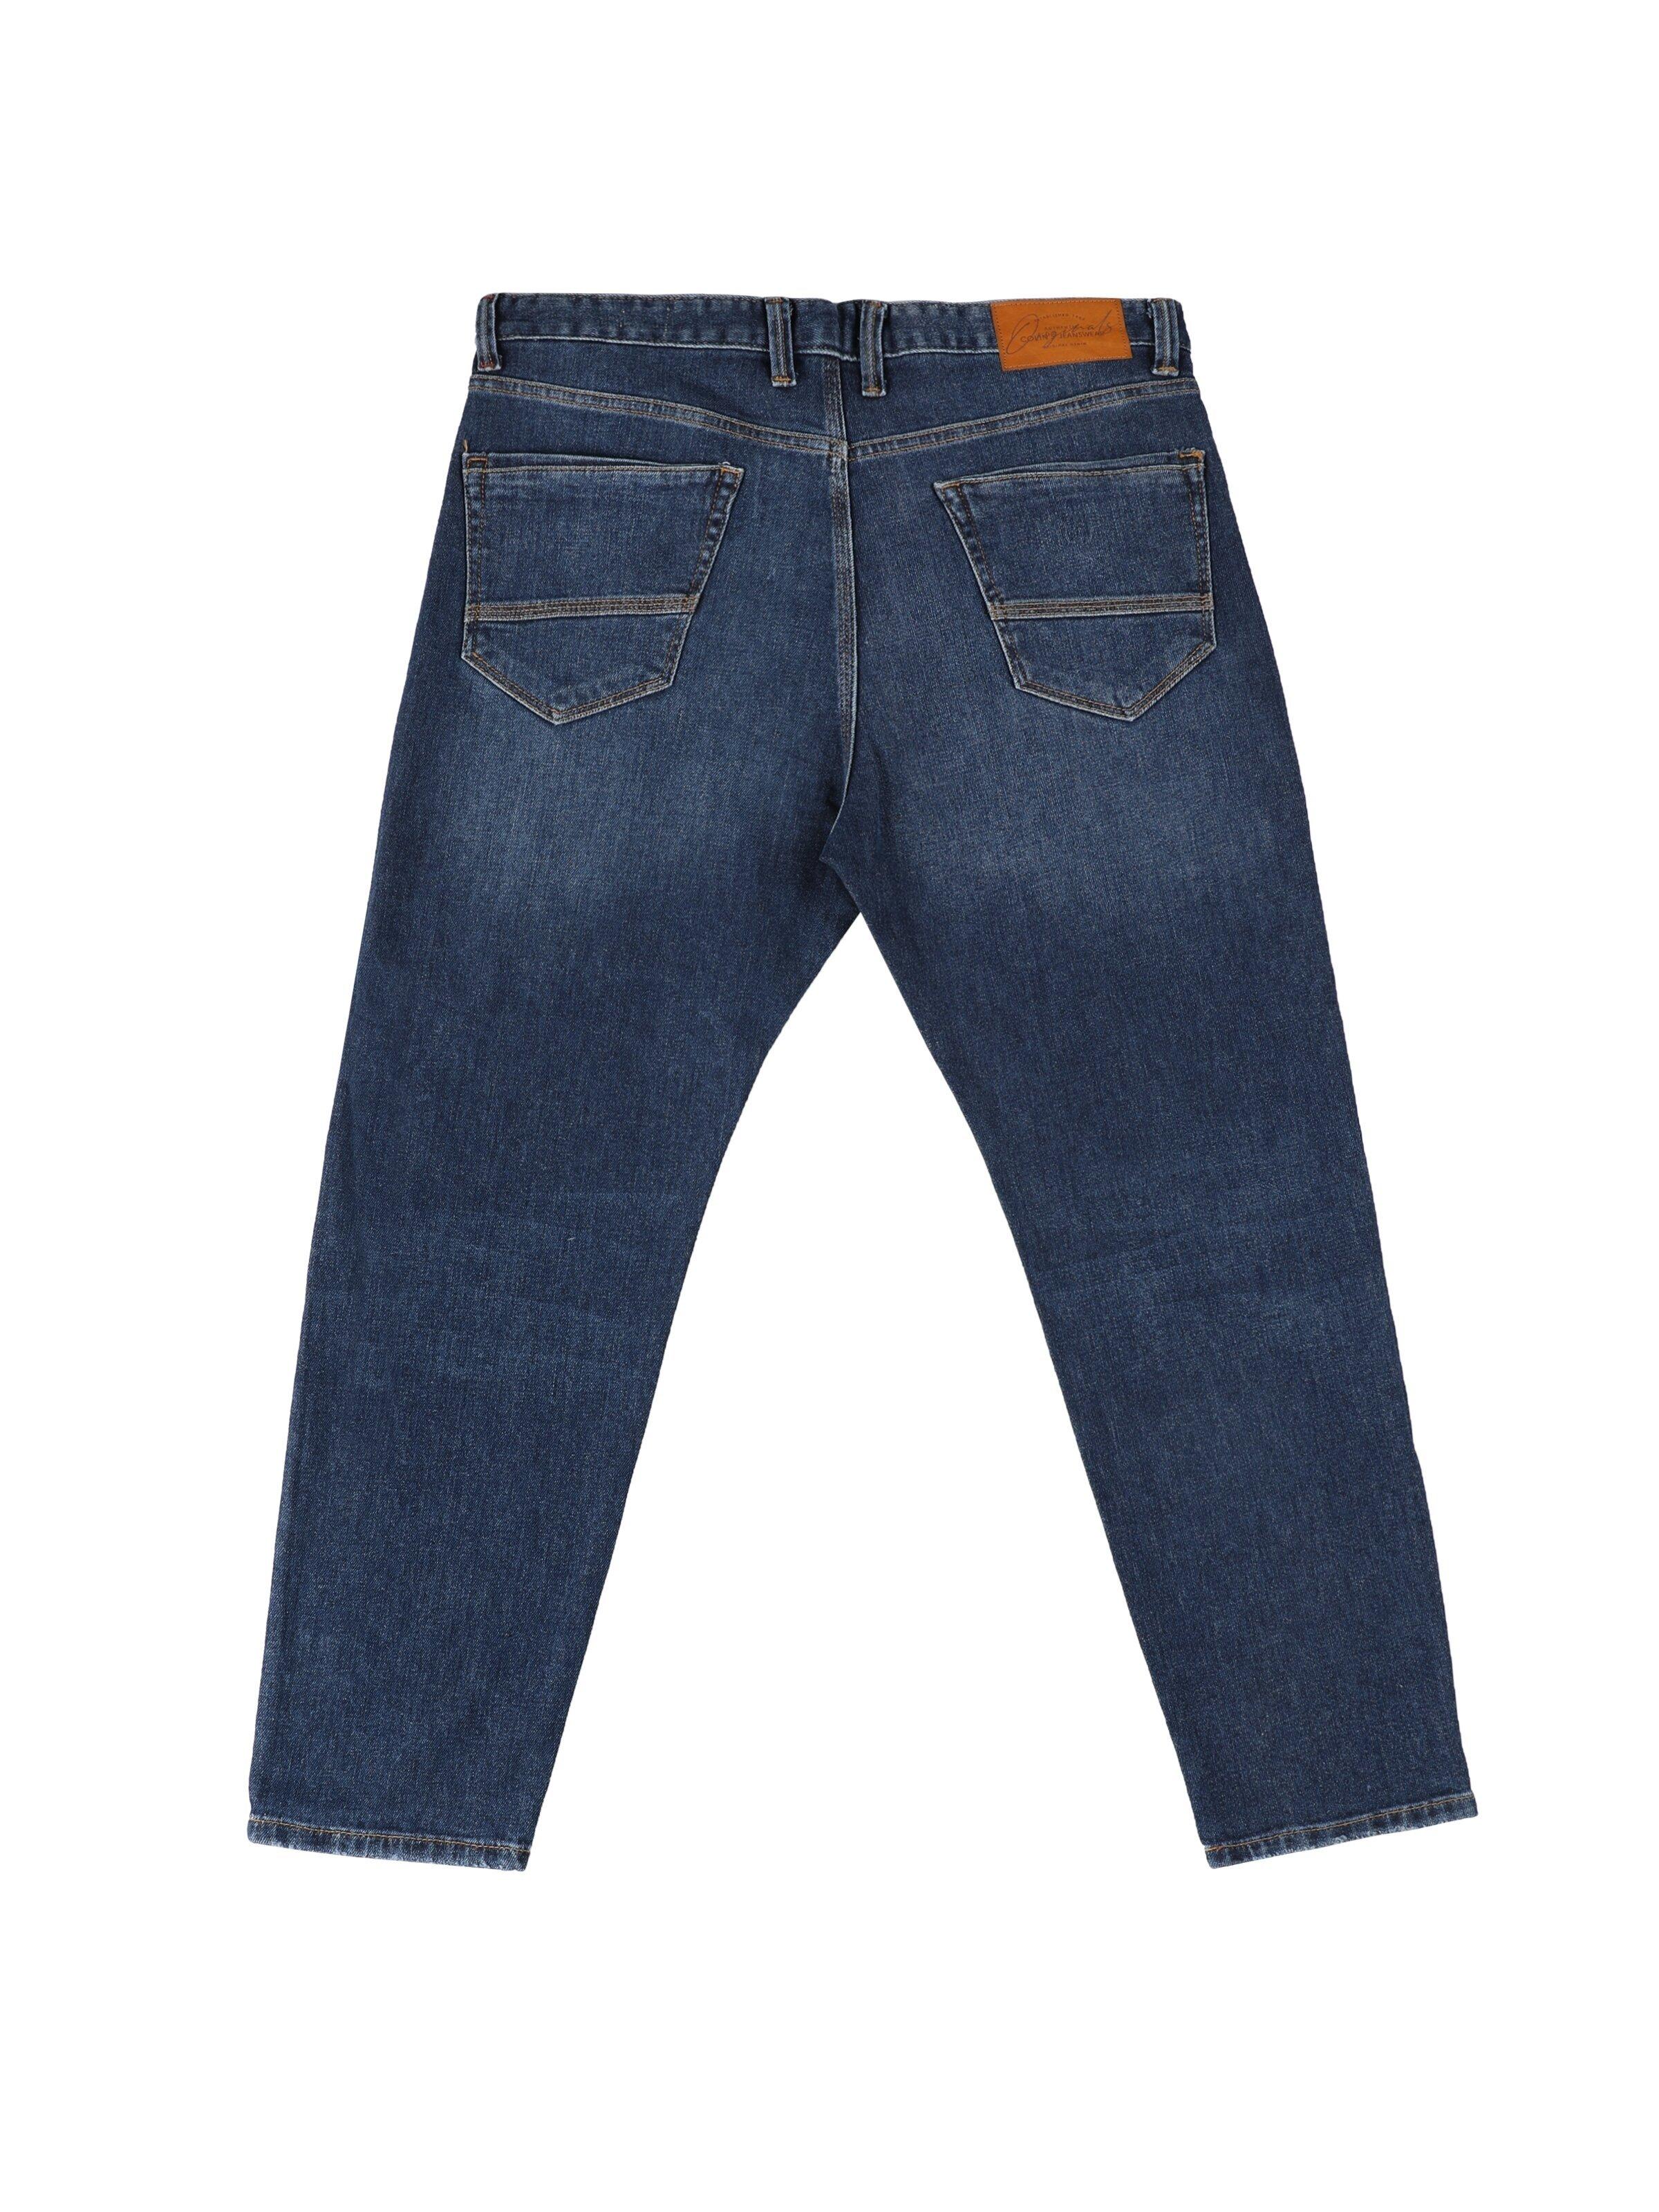 039 Lucas Drop Crotch Carrot Leg Carrot Fit Beyaz Erkek Jean Pantolon